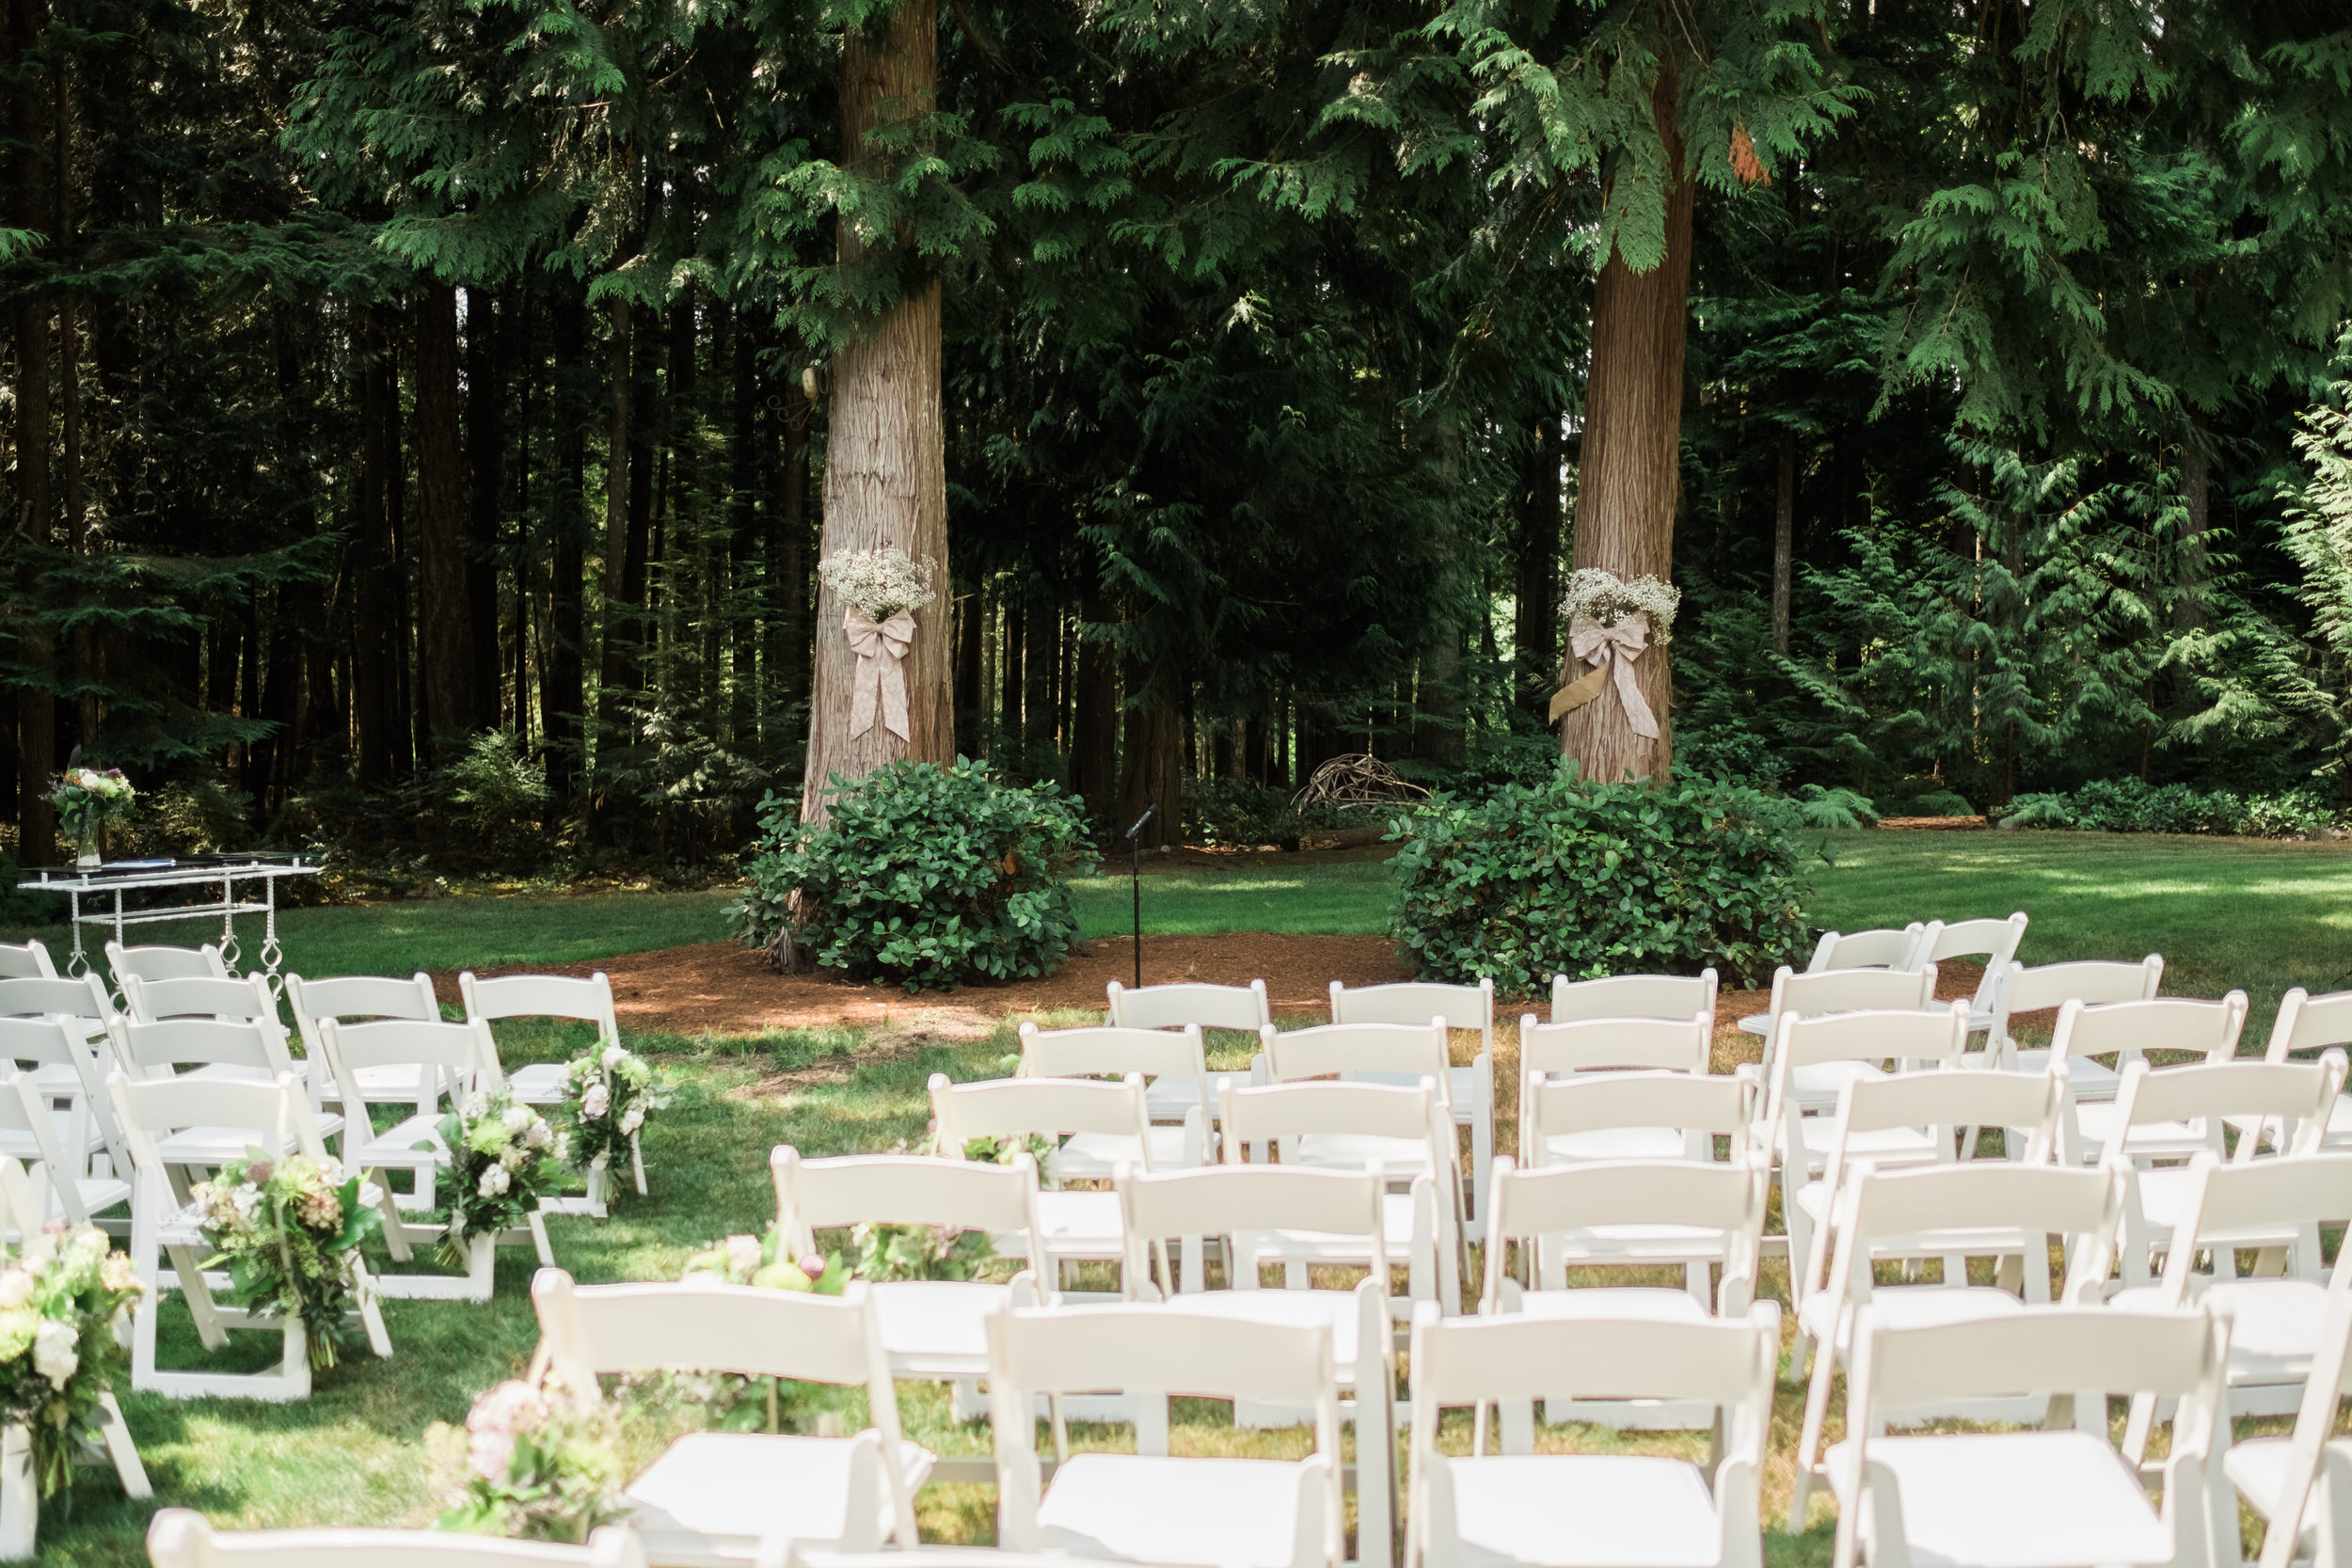 Linwood House Wedding Photos - Roberts Creek Wedding Photos - Vancouver Wedding Photographer & Videographer - Sunshine Coast Wedding Photos - Sunshine Coast Wedding Photographer - Jennifer Picard Photography - DSCF8504.jpg